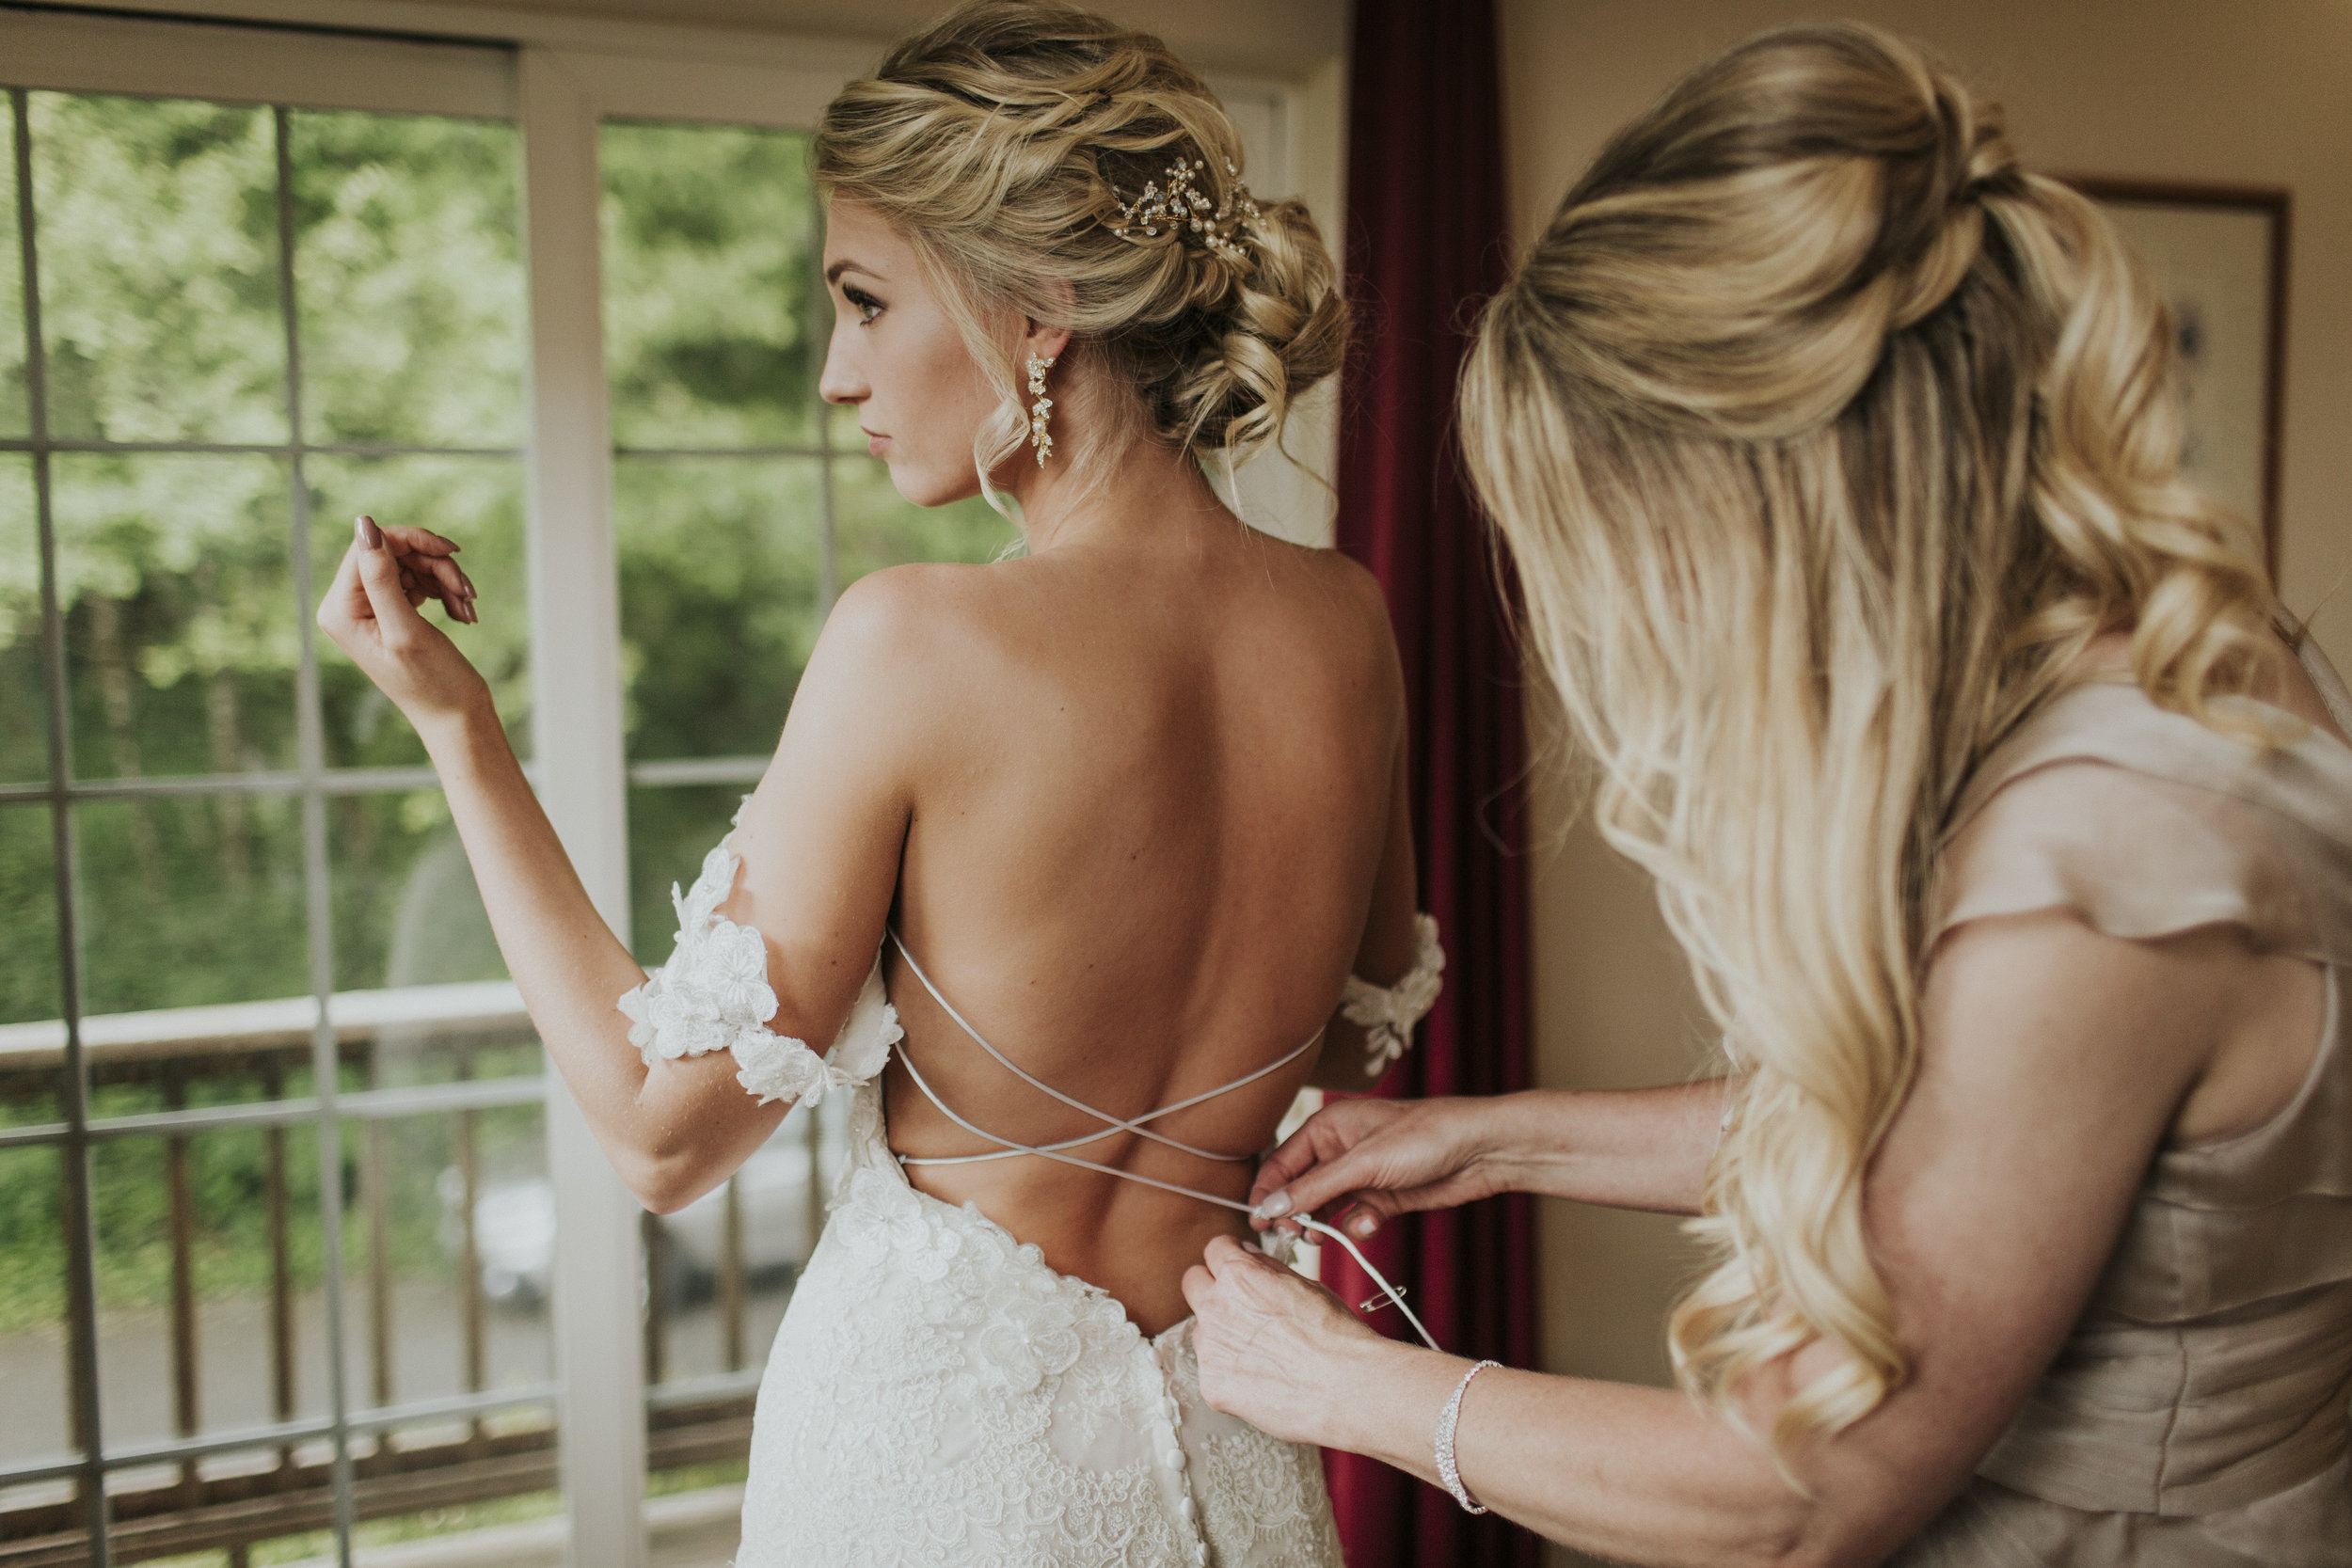 Good Seed bride designer wedding dress